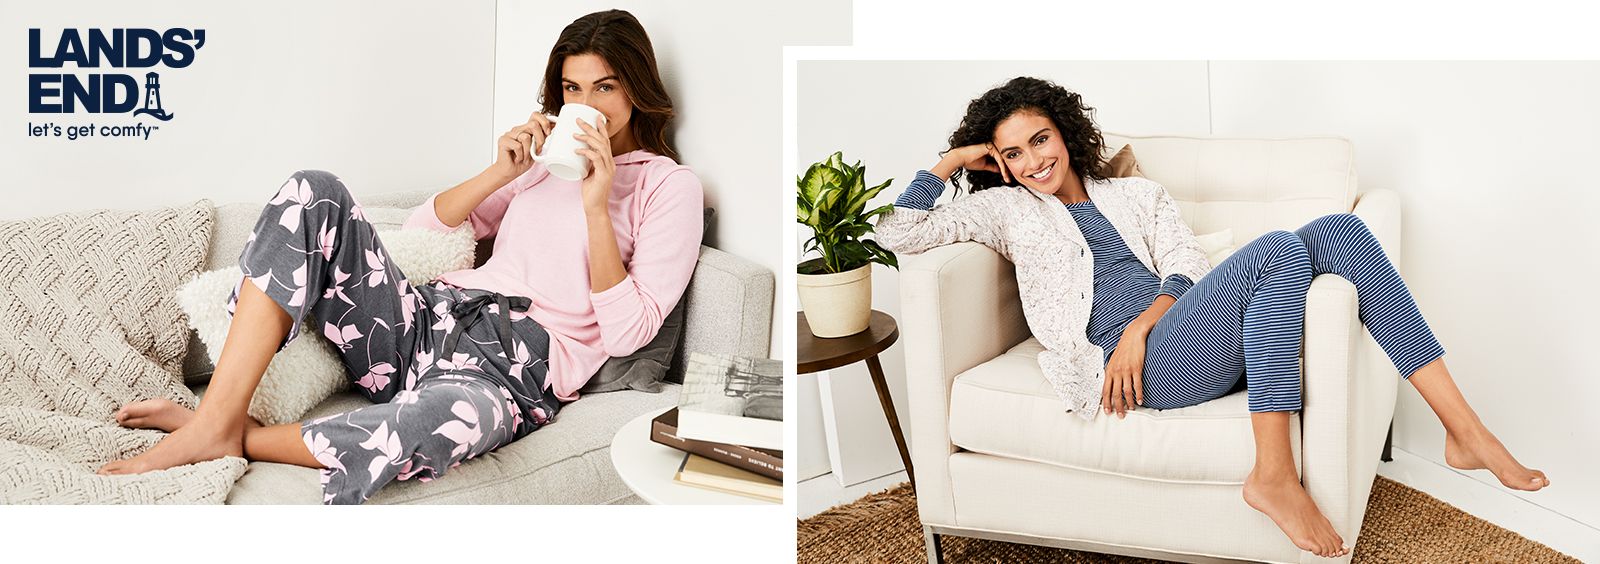 Comfy Women's Loungewear for Winter